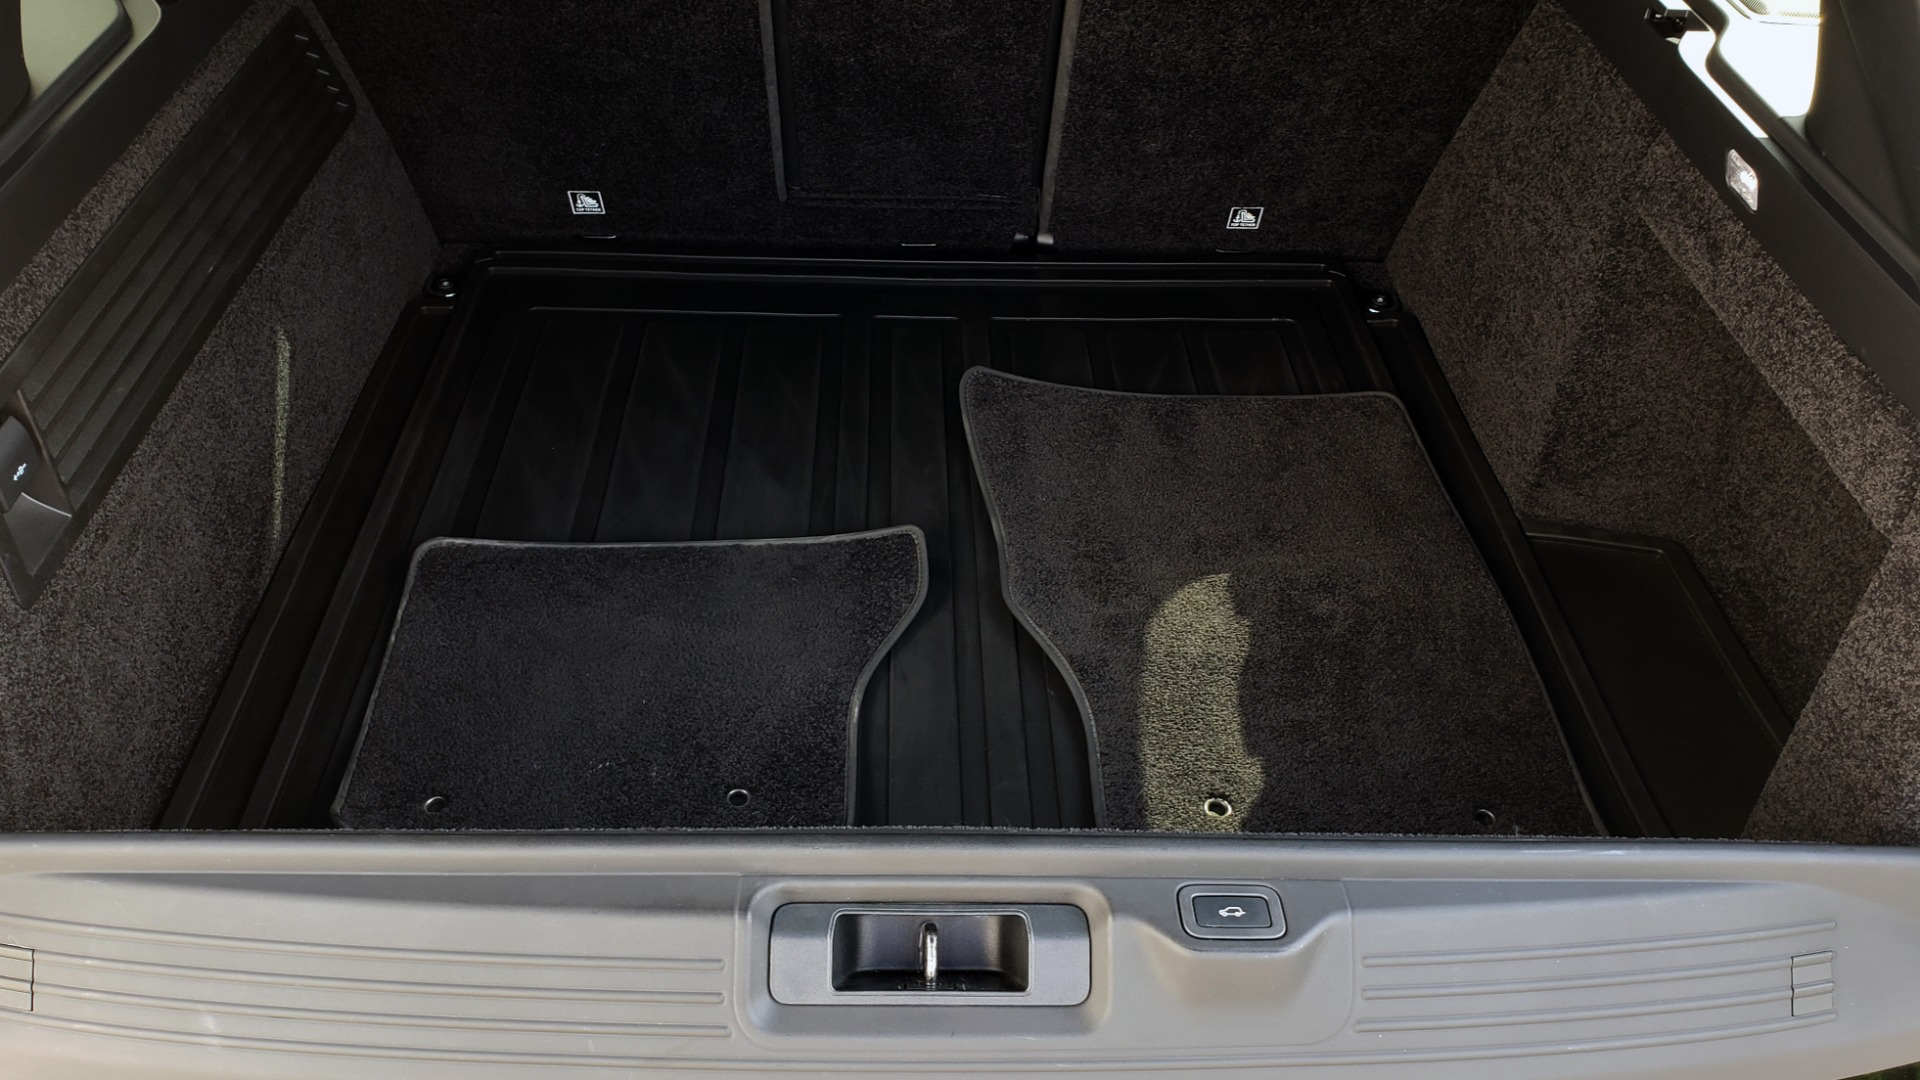 Used 2017 Land Rover RANGE ROVER SC V8 / VISION ASST / DRIVE PKG / MERIDIAN SOUND / PANO-ROOF / NAV / BSM for sale $75,995 at Formula Imports in Charlotte NC 28227 18